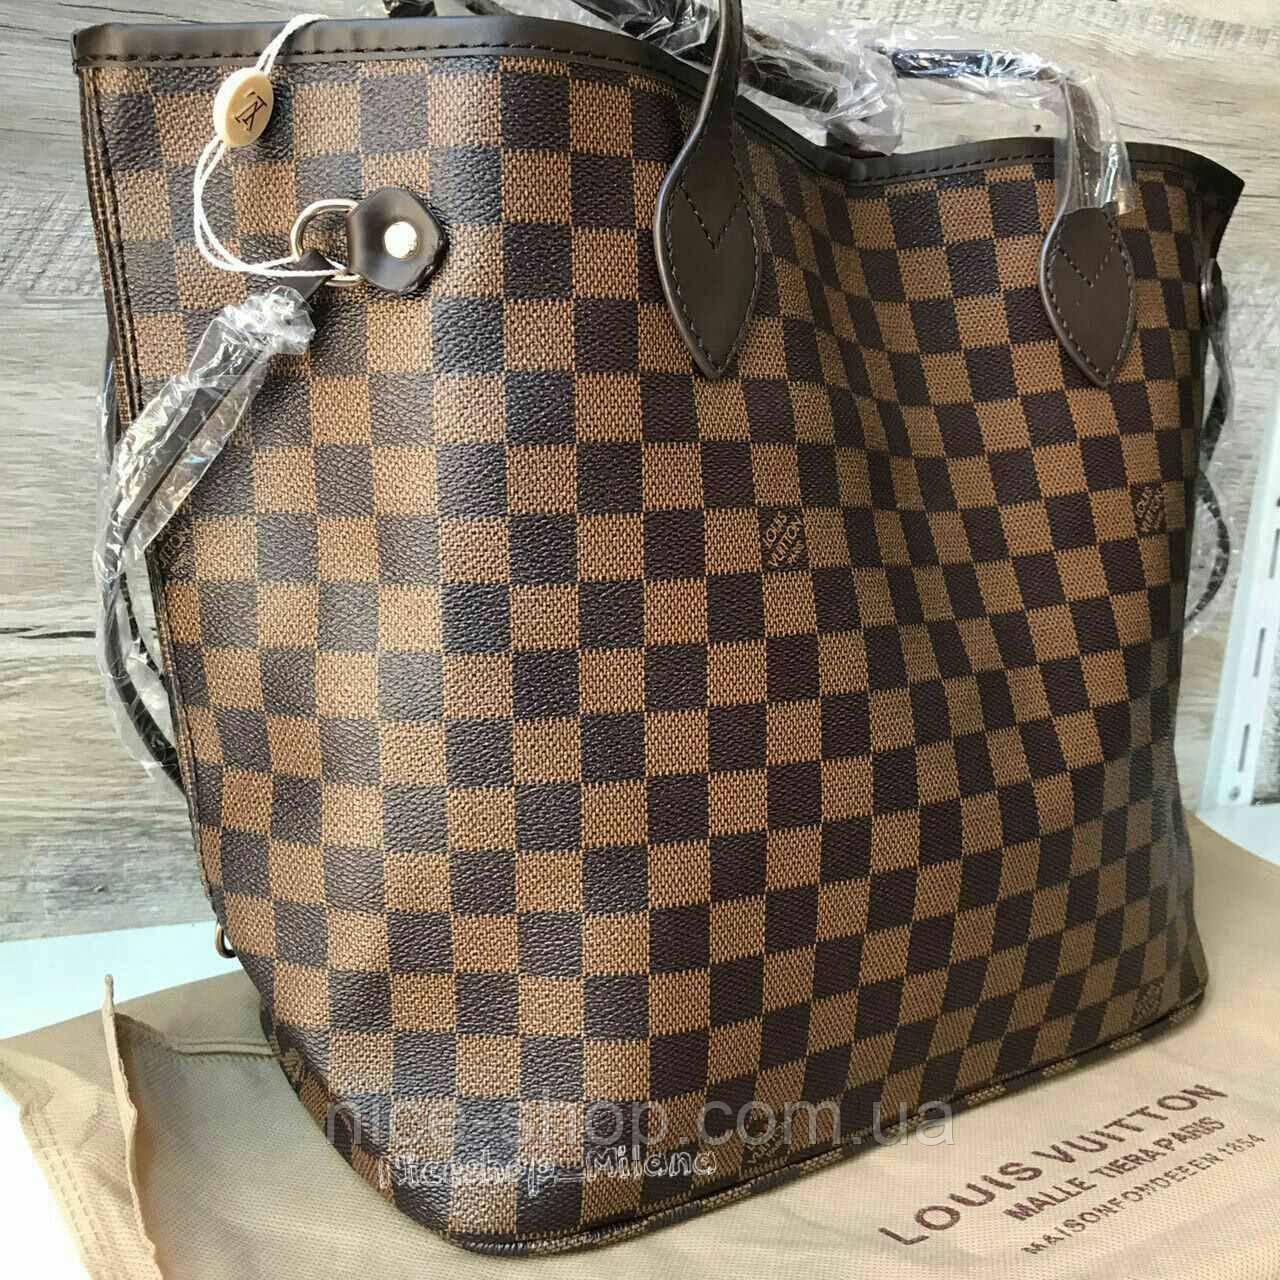 756e4285d1d1 ... Сумка Louis Vuitton Neverfull Medium коричневая в клетку, фото 4 ...